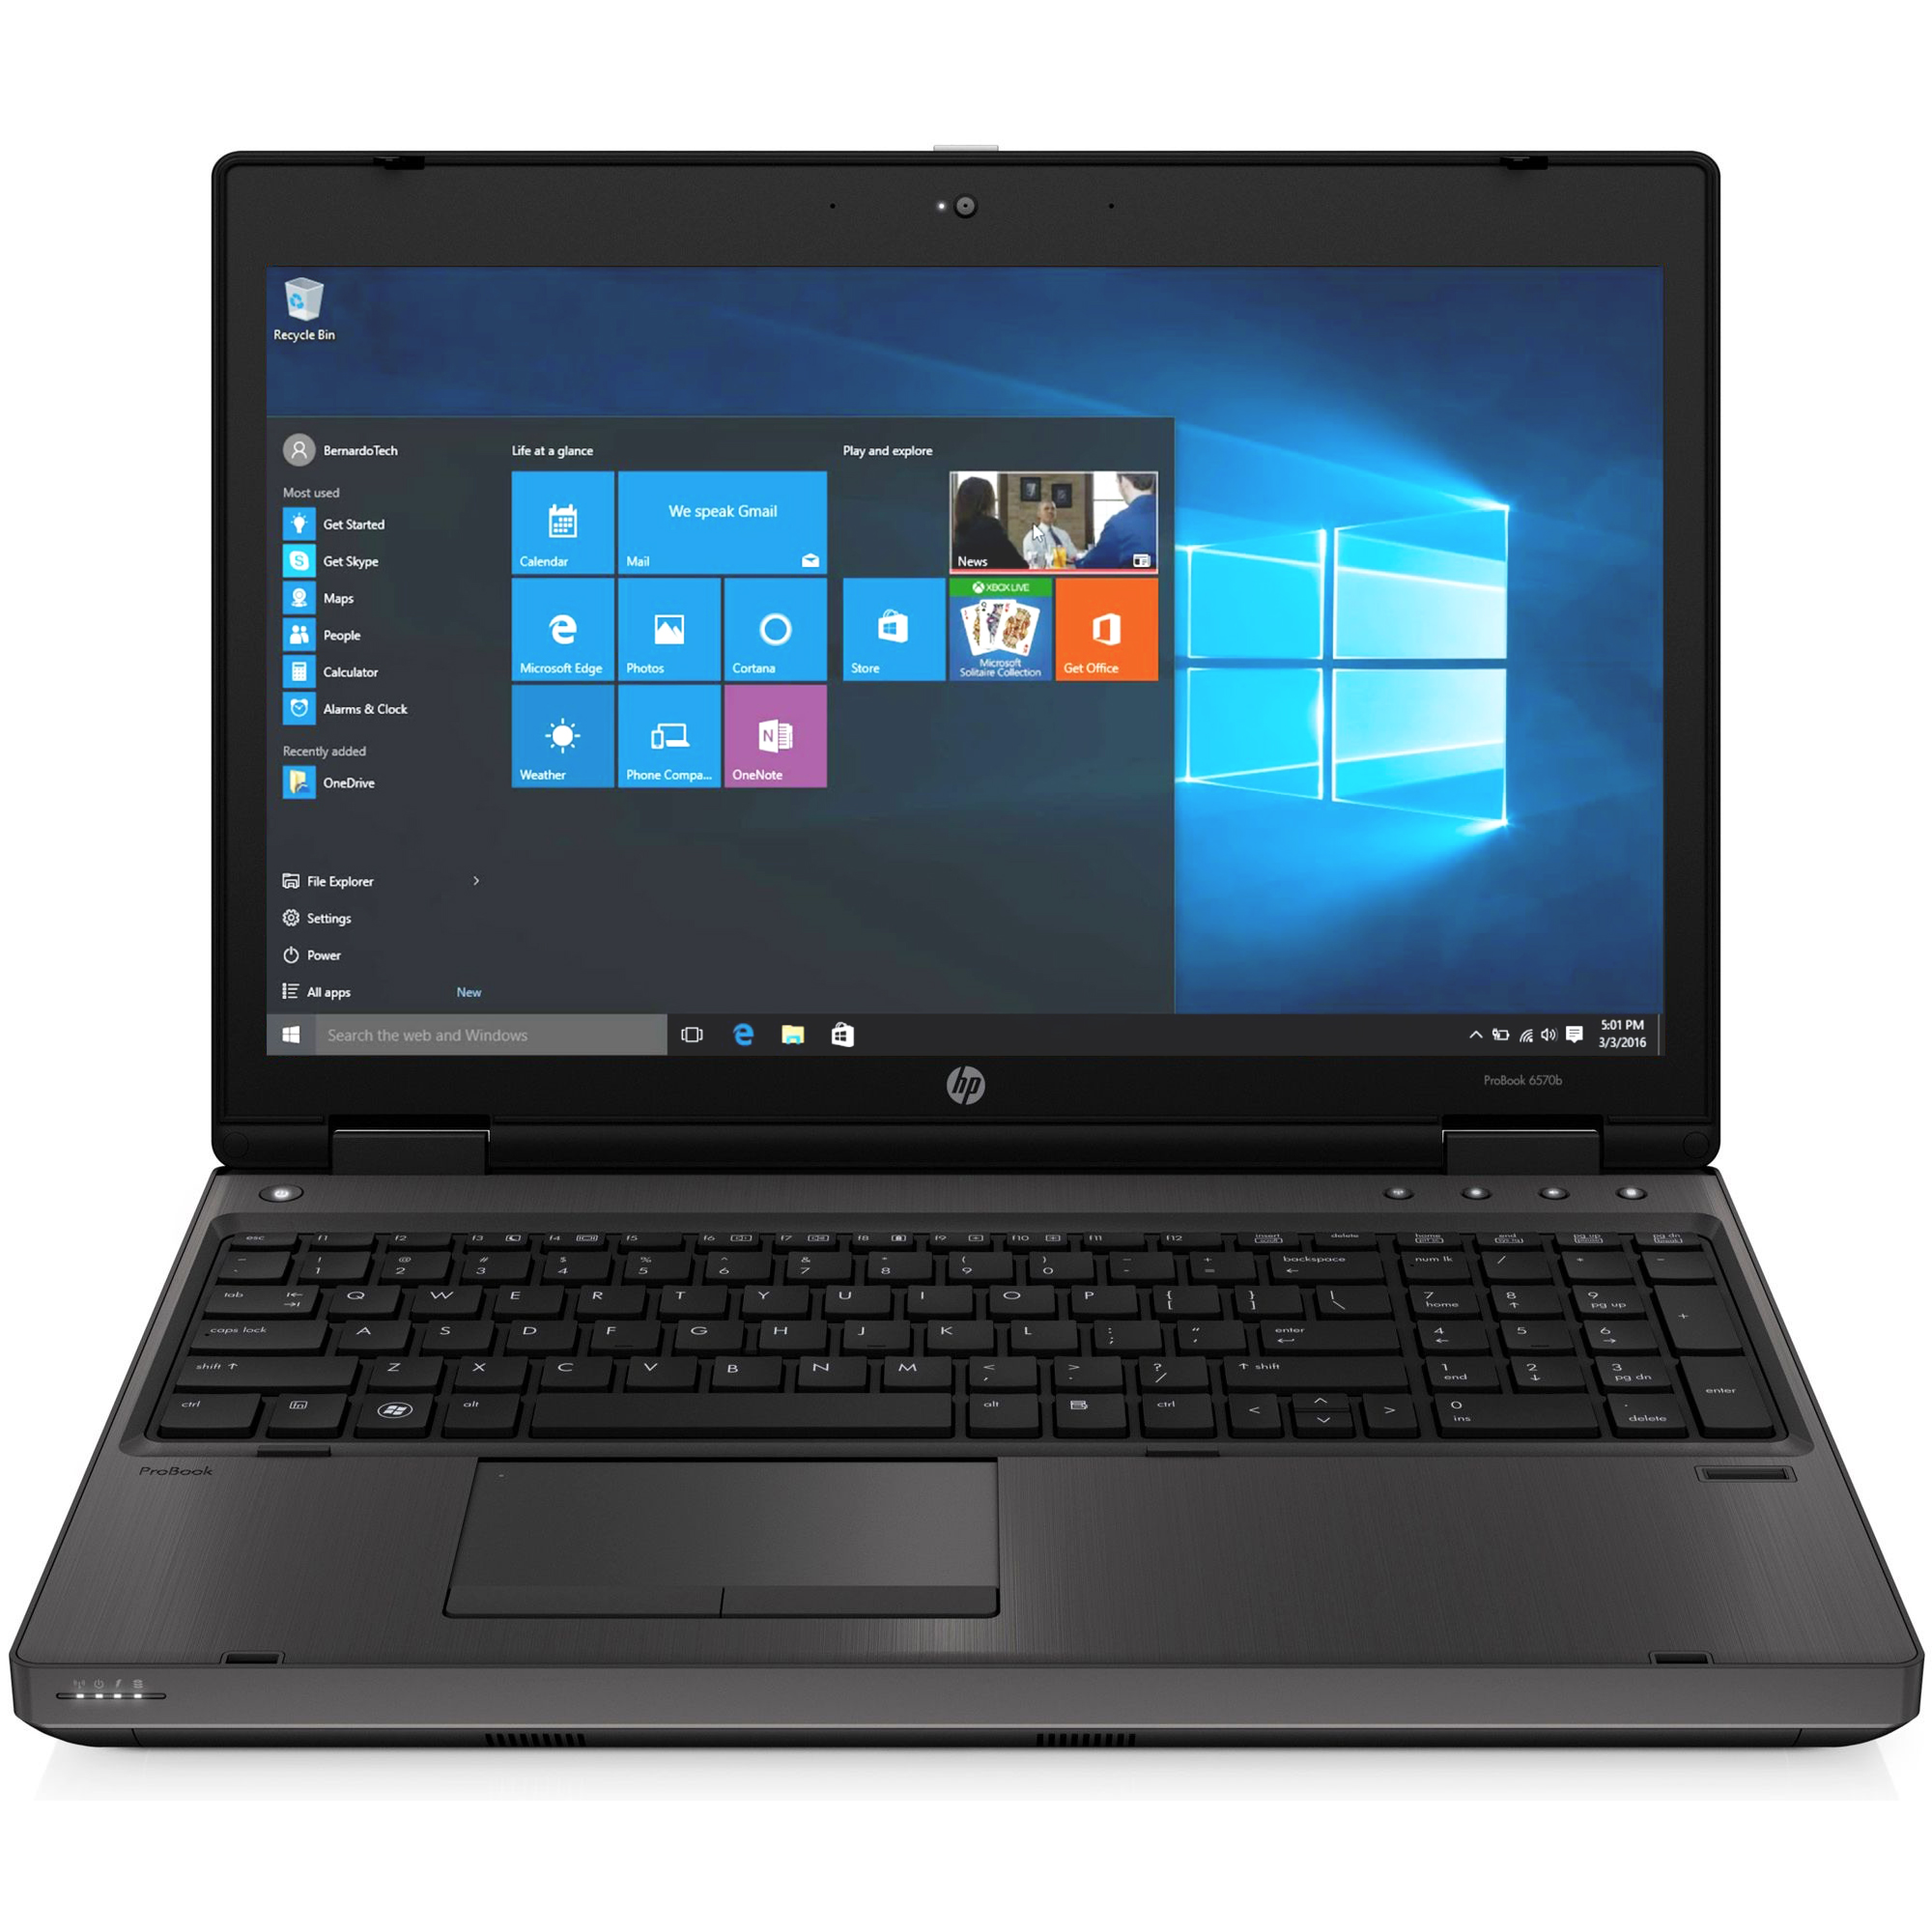 Laptop HP 6570b, Intel Core i5-3210M 2.50GHz, 4GB DDR3, 240GB SSD, DVD-RW, 15.6 Inch, Webcam, Tastatura Numerica, Grad B (0313)